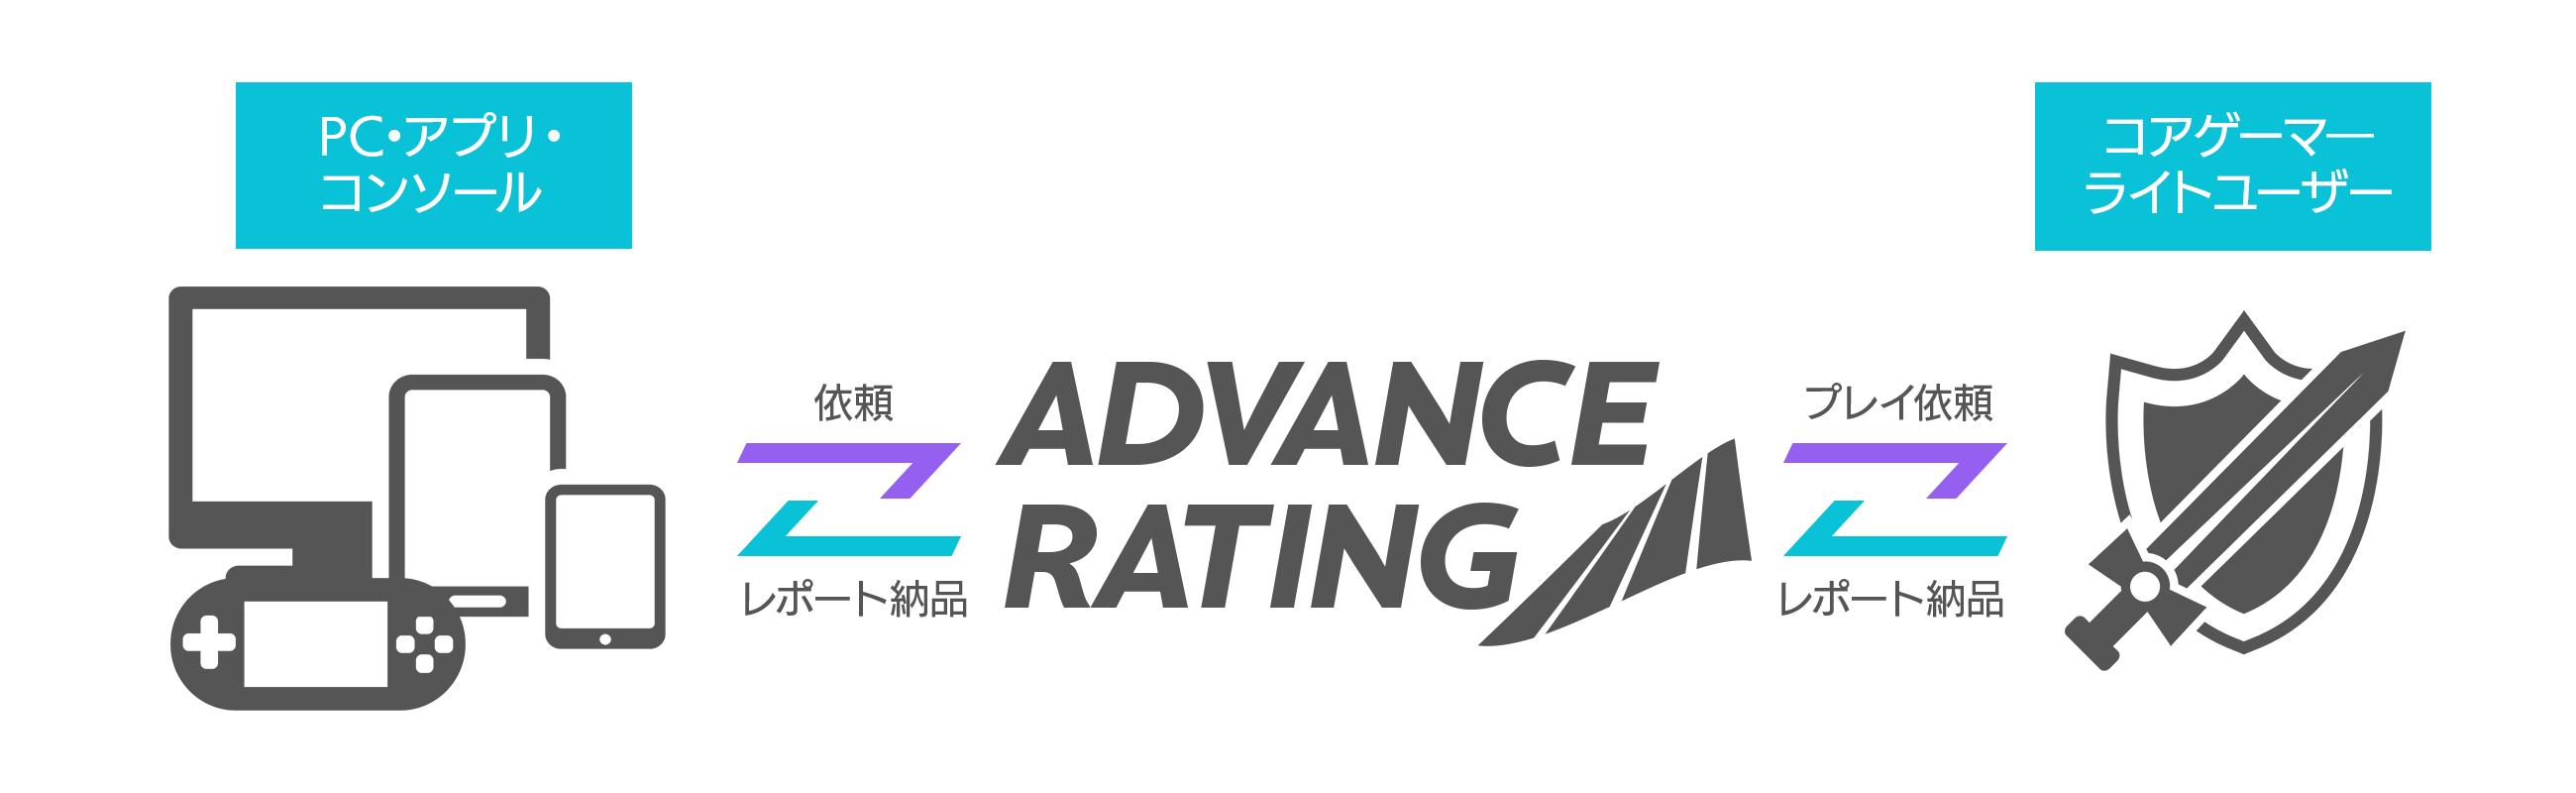 ADVANCE RATINGサービス概要図